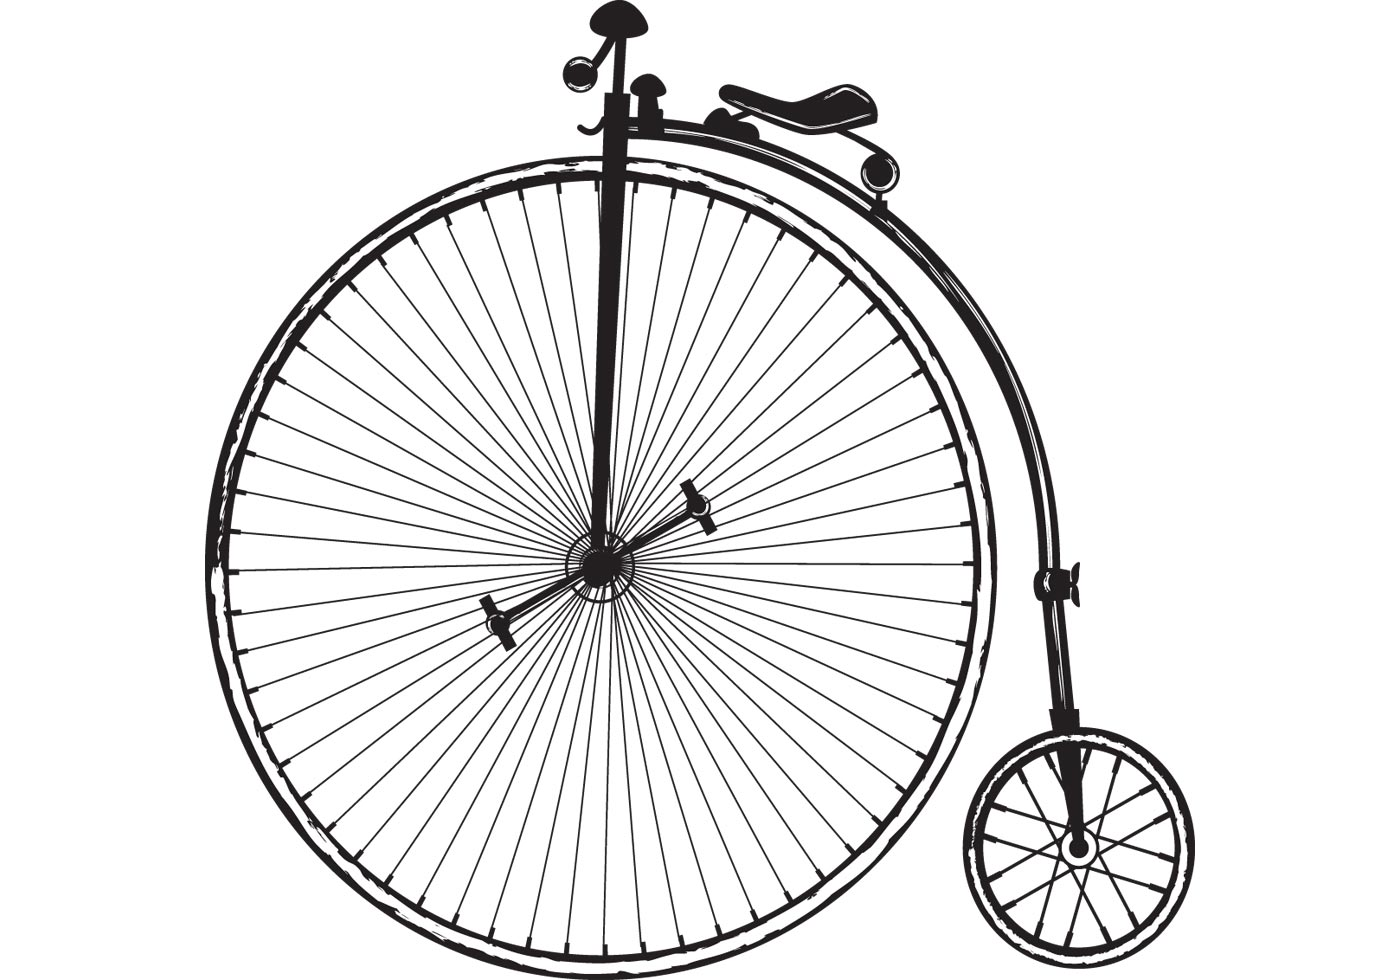 Old Fashioned Bike With Big Wheel